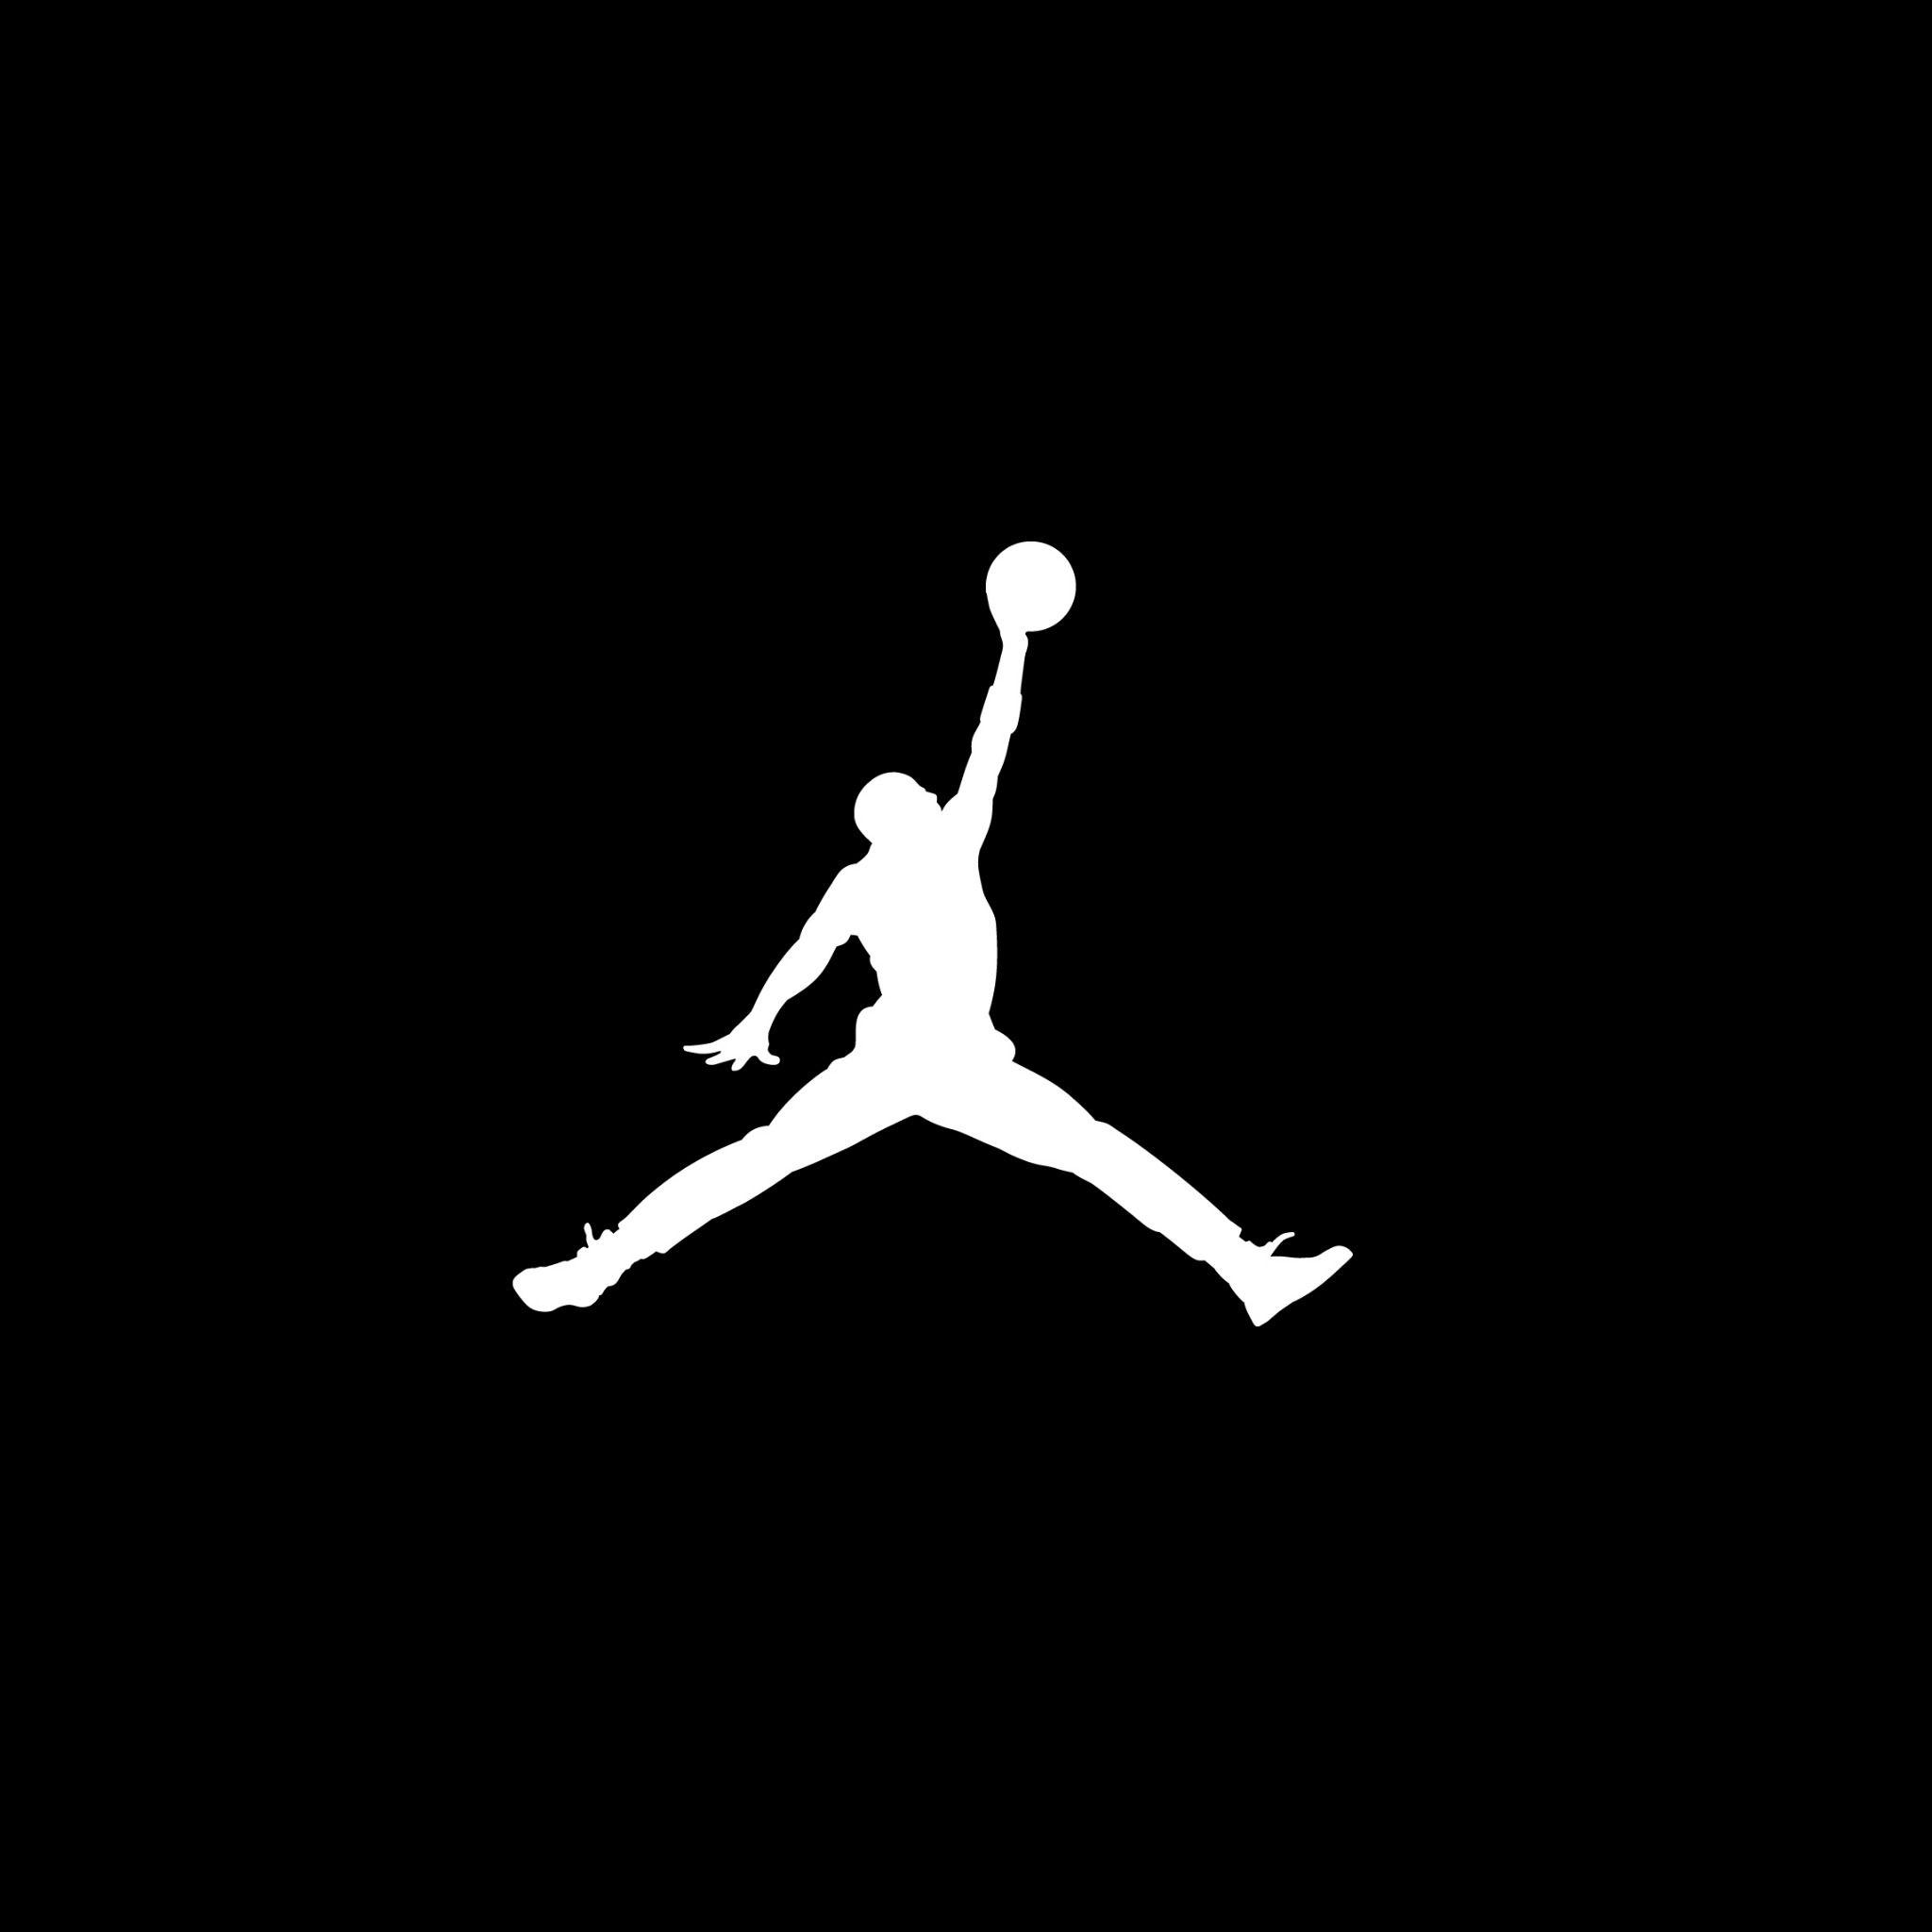 jordan shoes 4k wallpaper gaming tracer bullets 753380